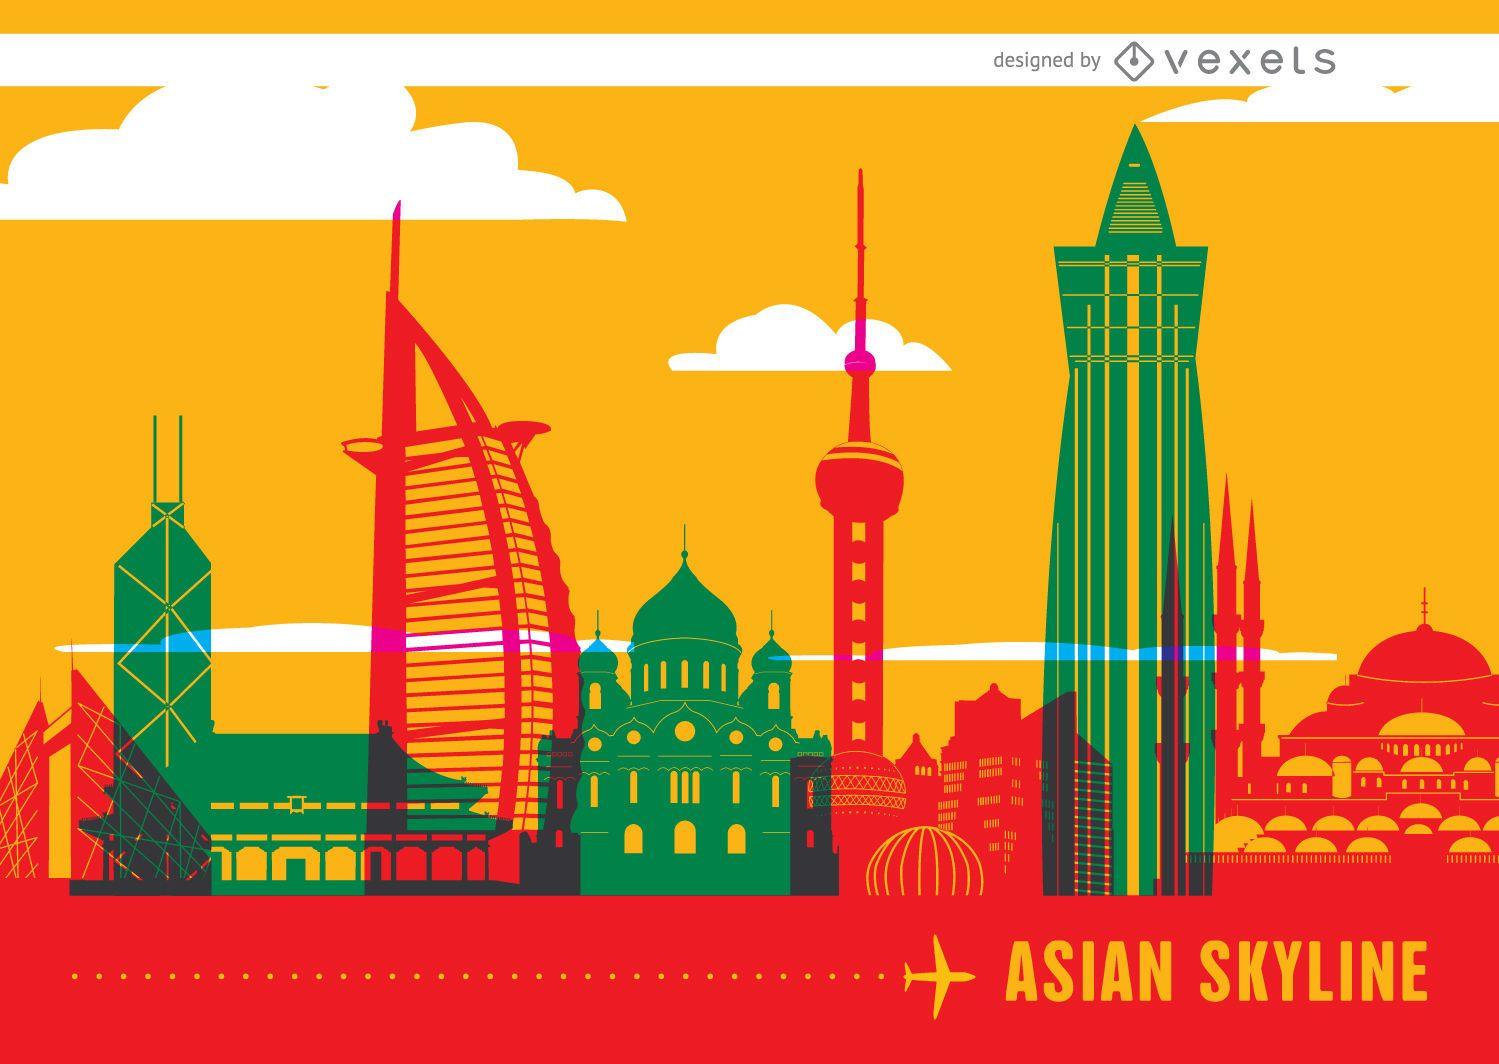 Asian skyline landmarks